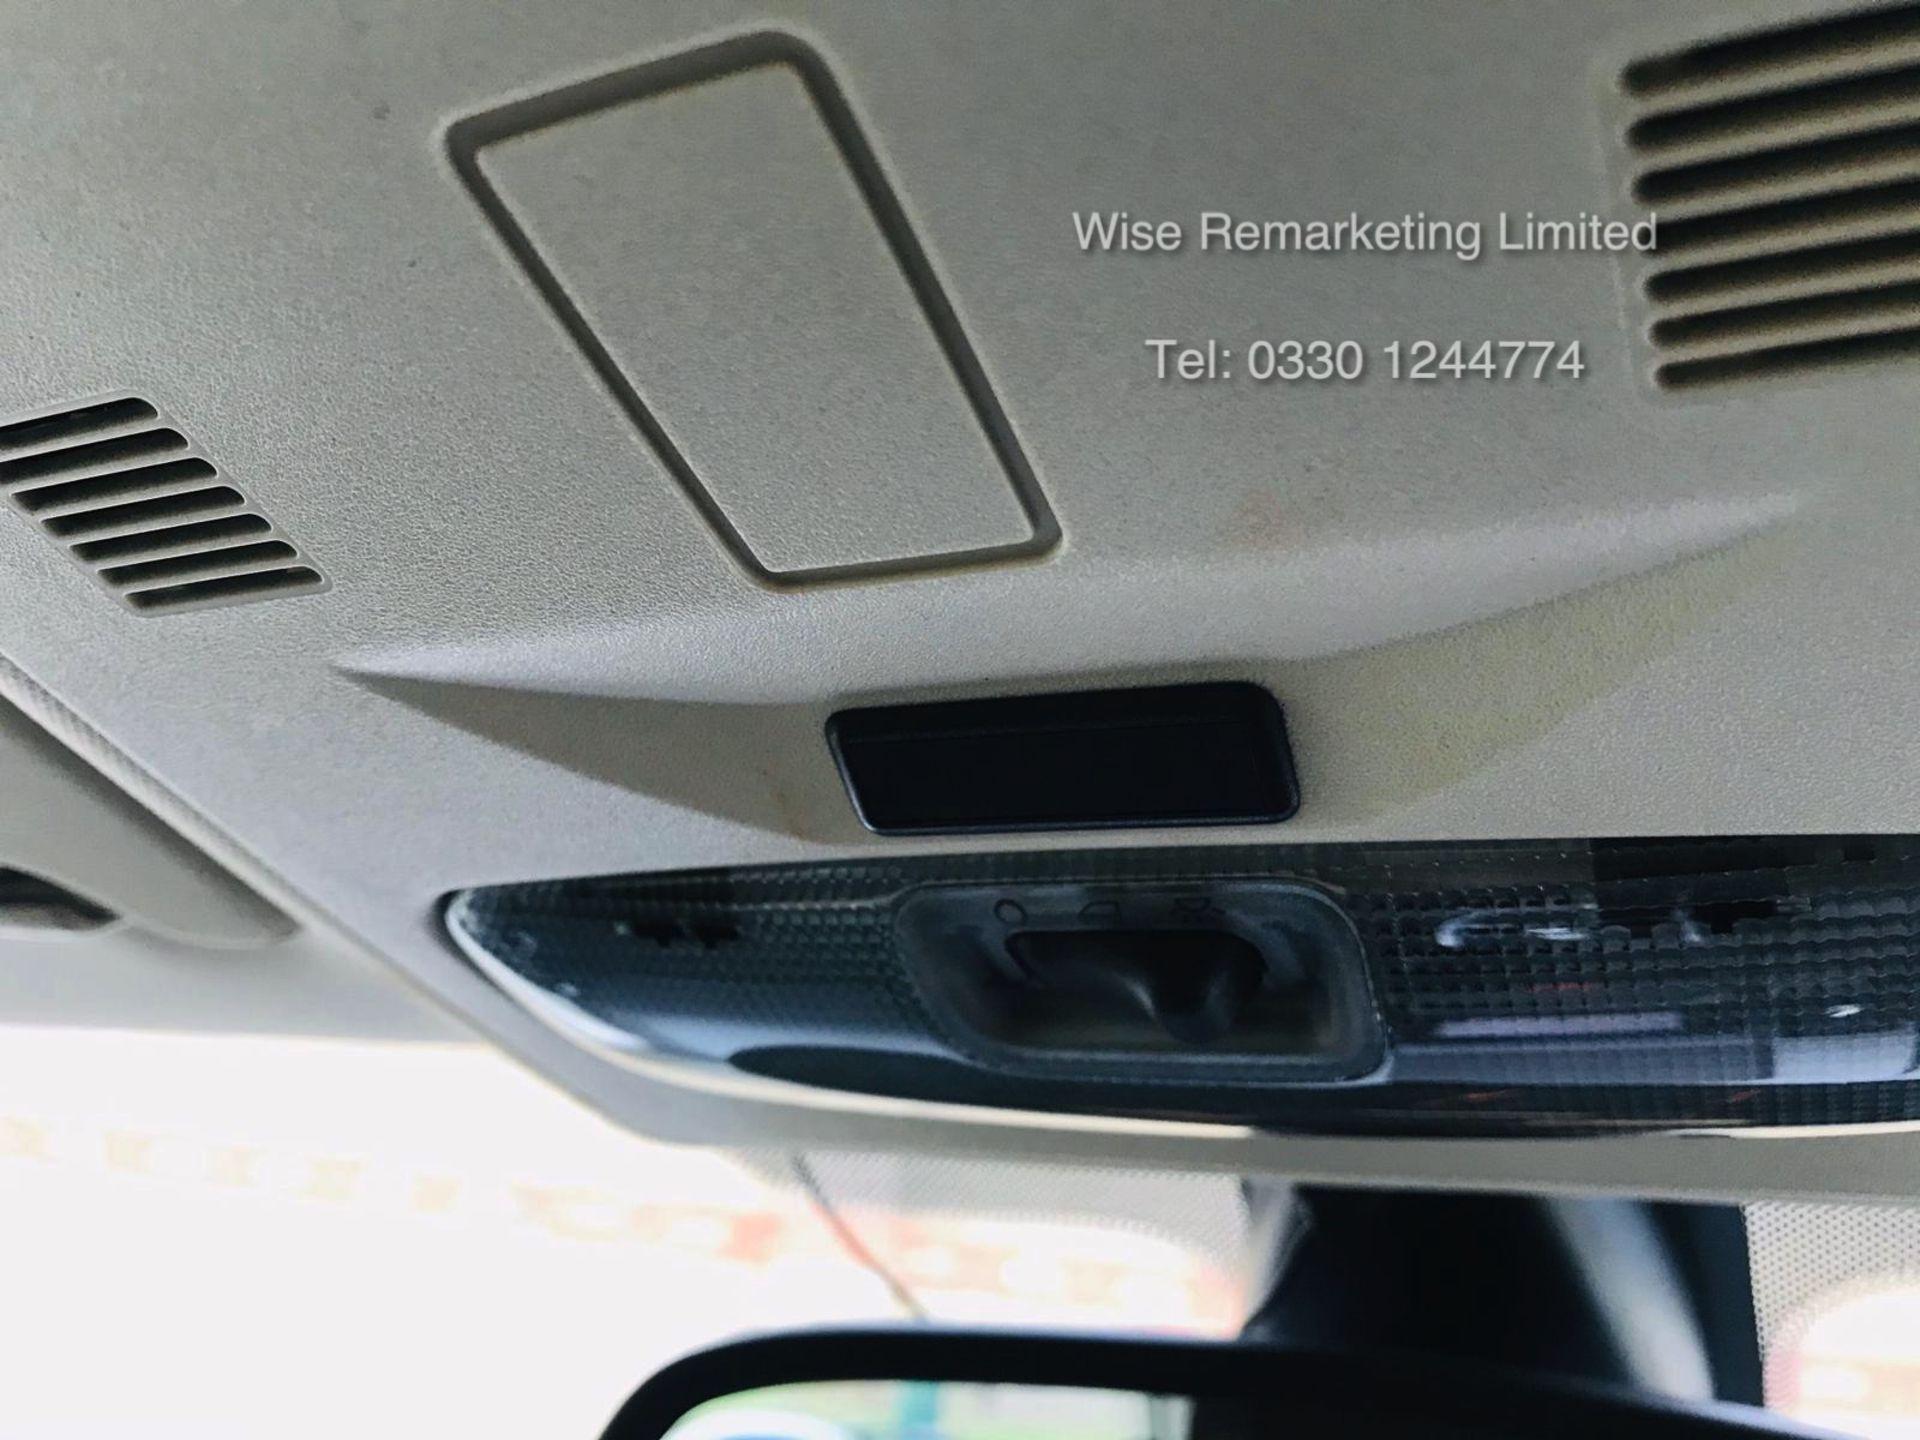 (RESERVE MET)Land Rover Freelander GS 2.2 TD4 Auto - 2009 09 Reg - Service History - Sat Nav - Image 24 of 27